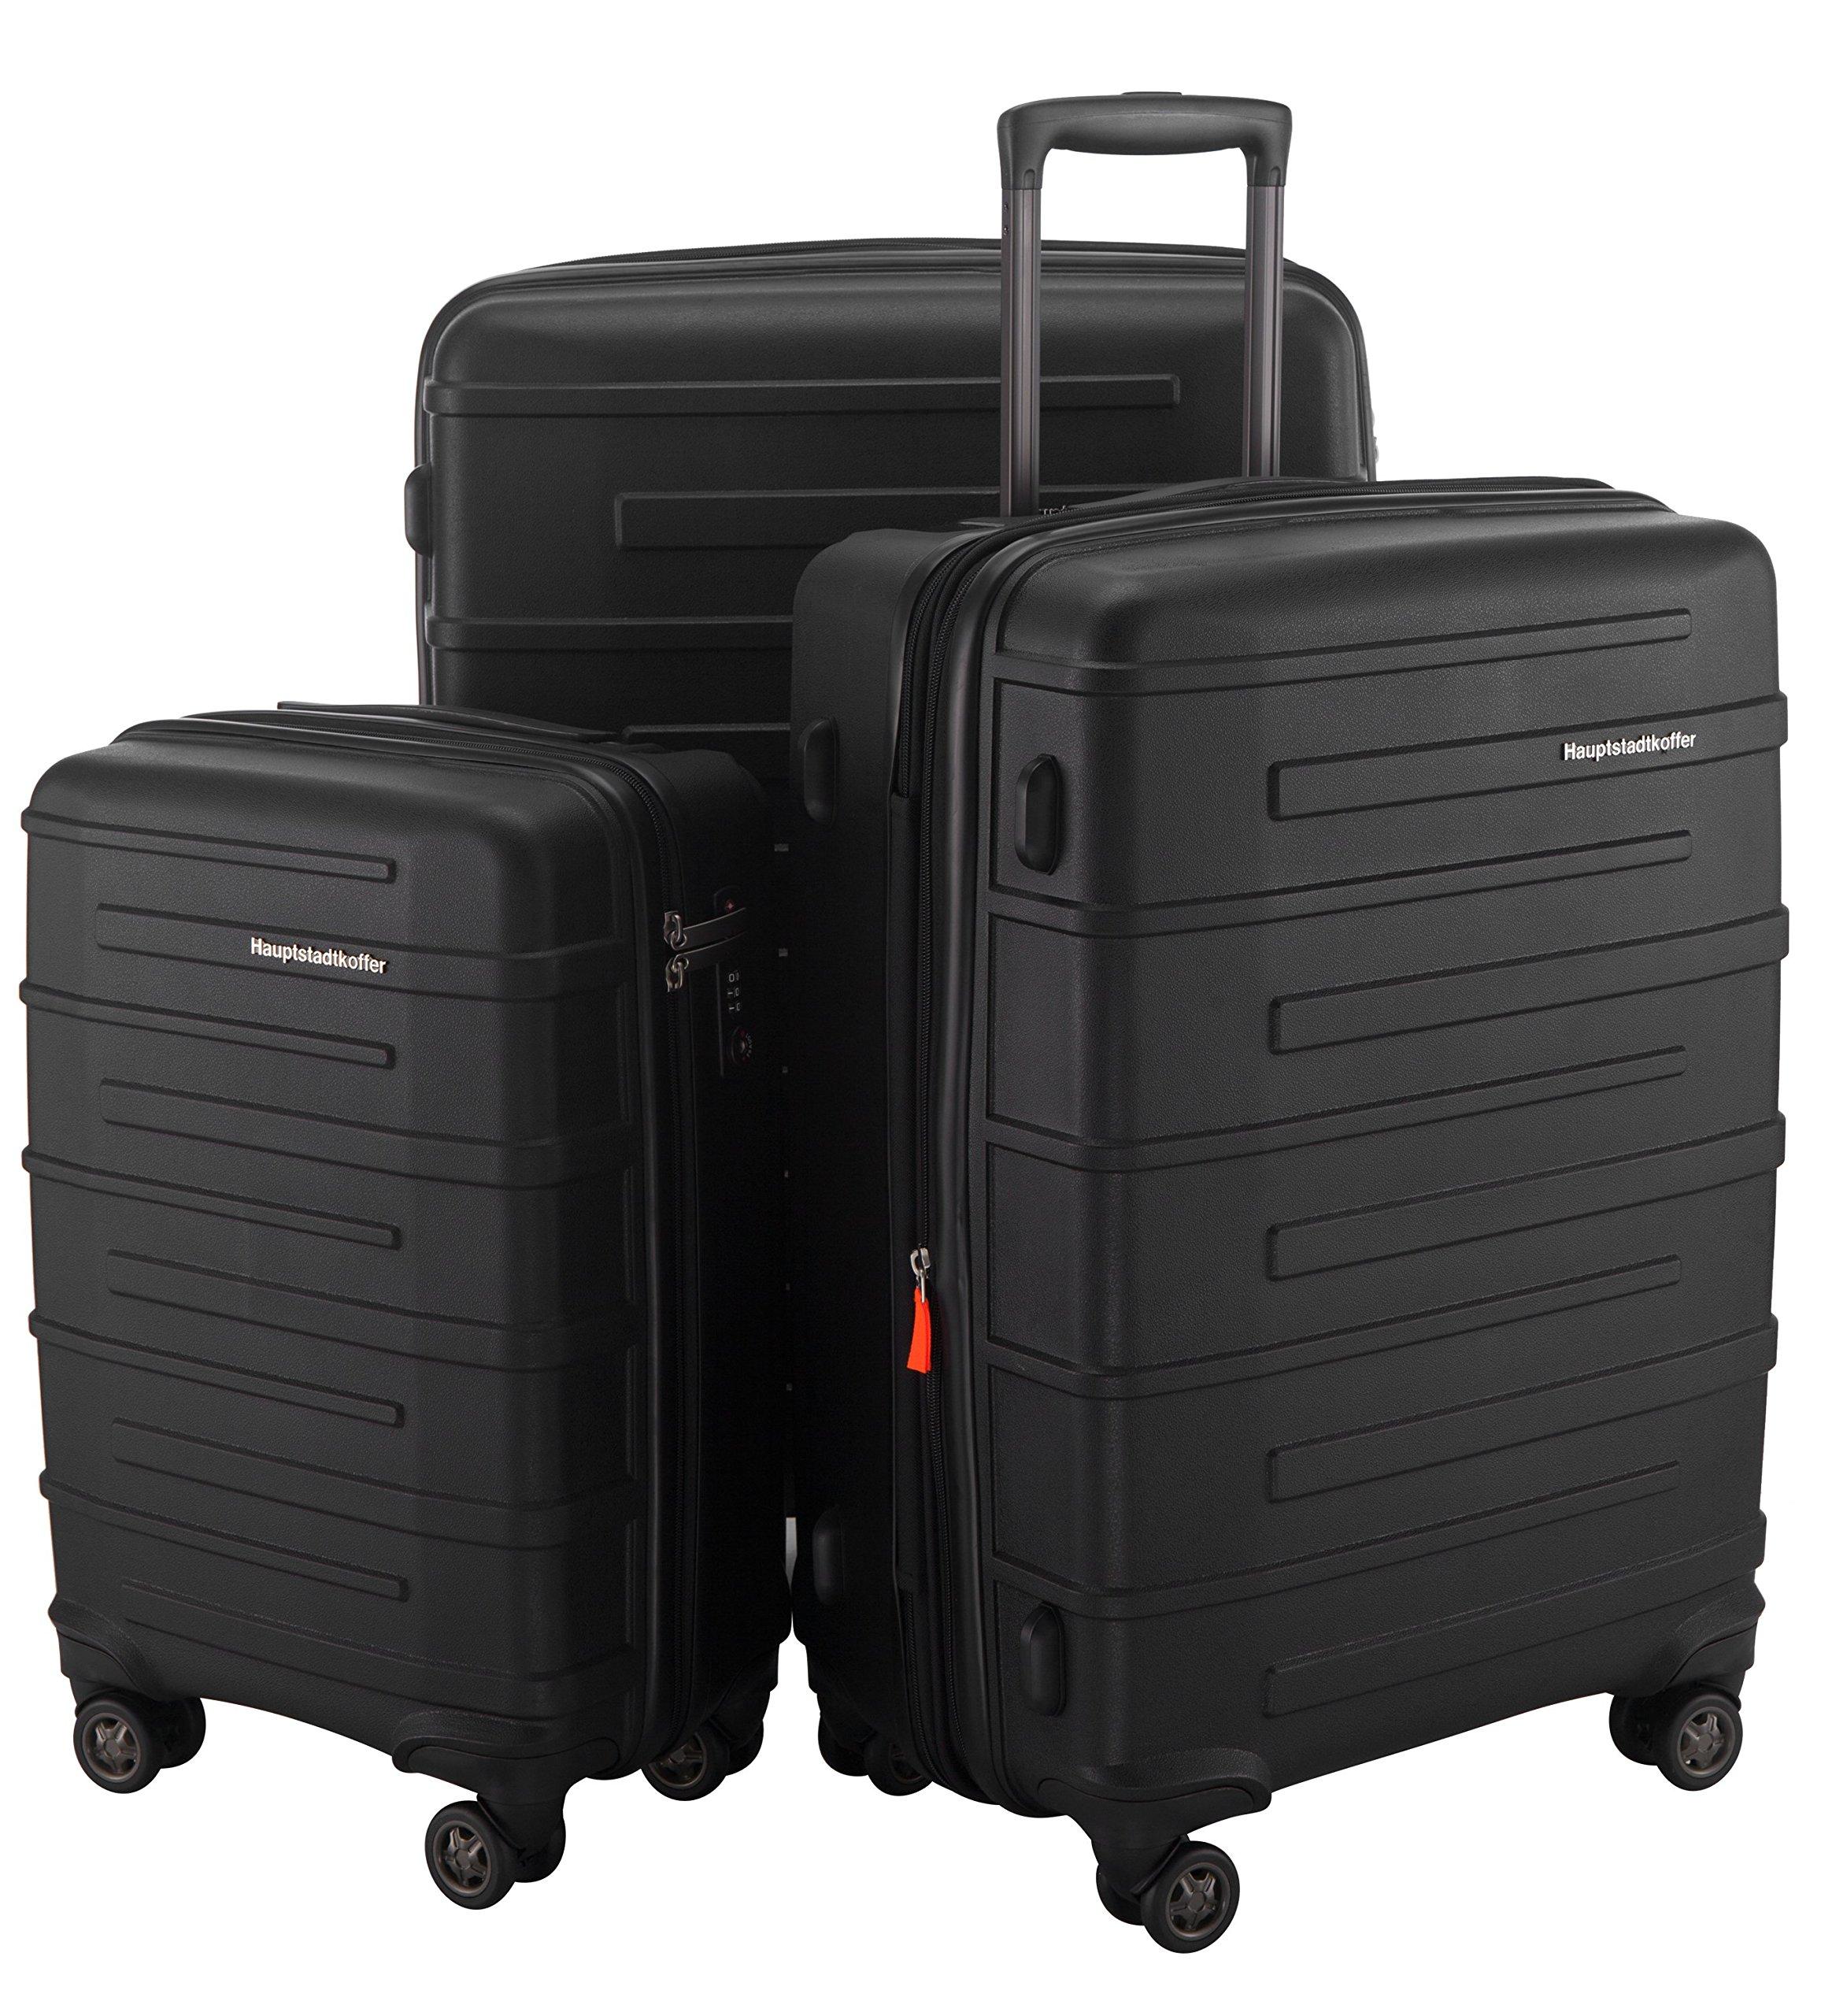 HAUPTSTADTKOFFER Ostkreuz Luggages Set Matt Suitcase Set Hardside Spinner Trolley Expandable (20¡°, 24¡° & 28¡°) TSA Black